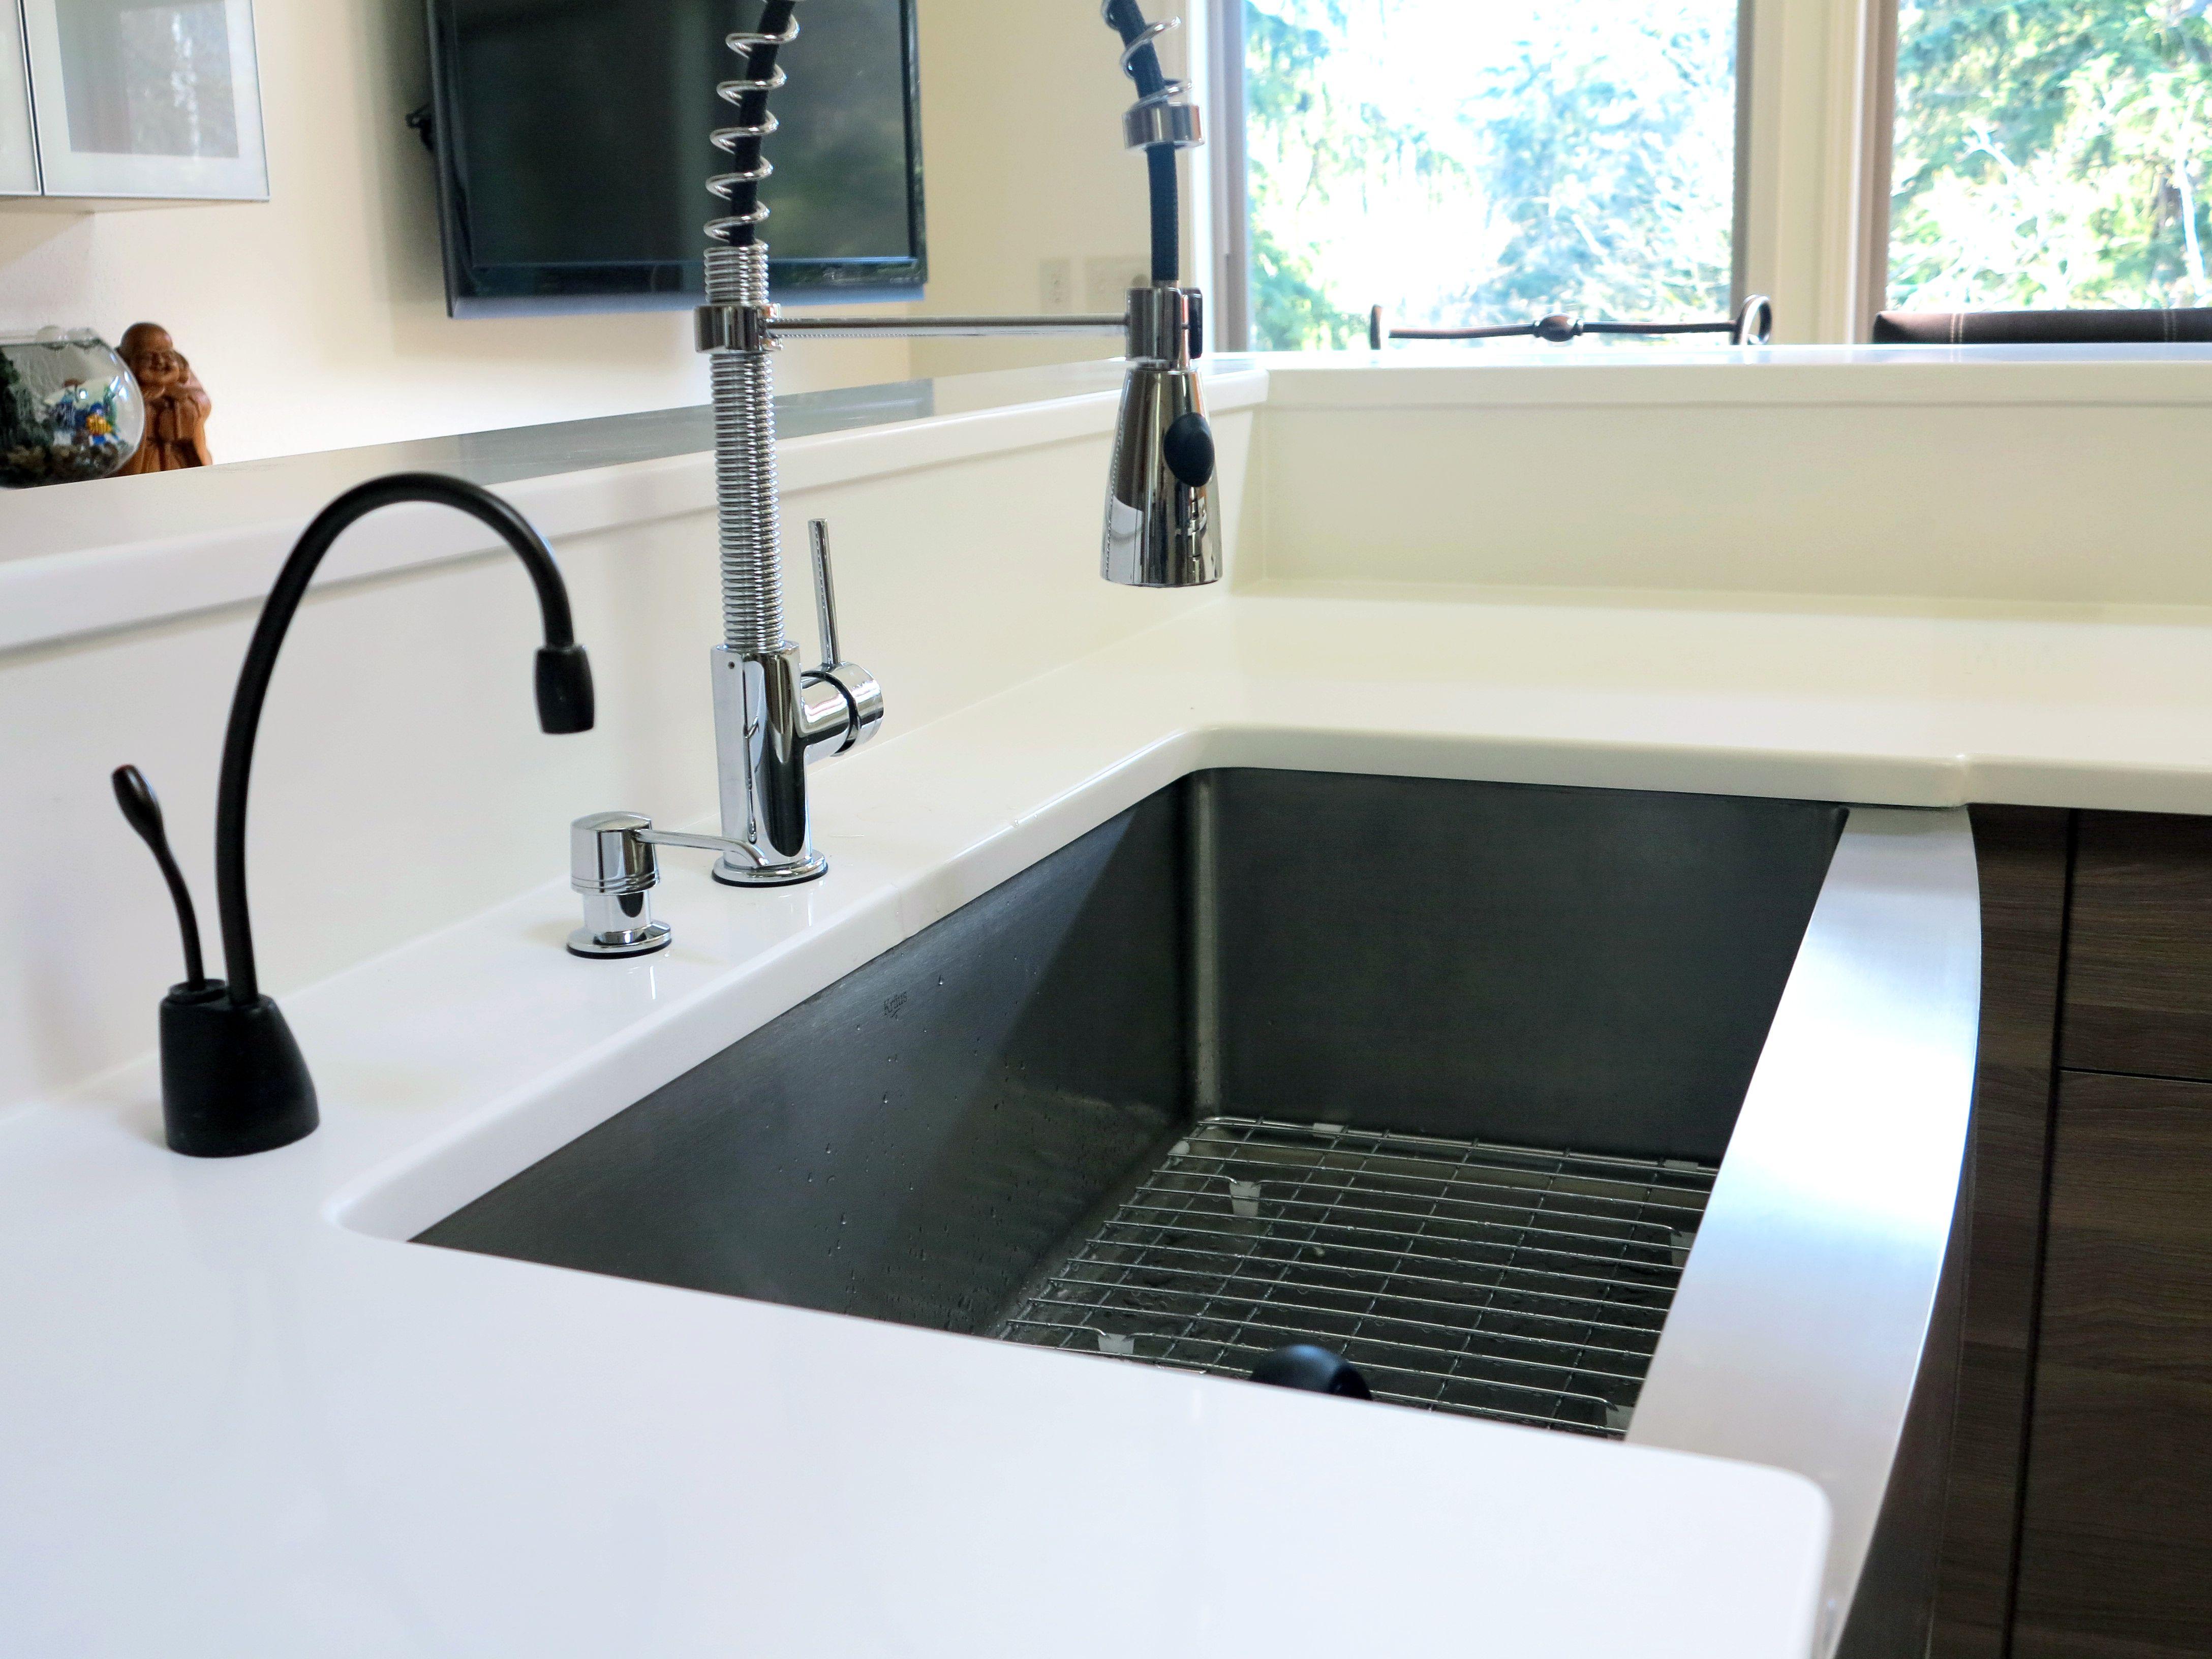 Quartz Countertop Seattle By Granitemarblewa Com Countertops Kitchen Visualizer Granite Countertops